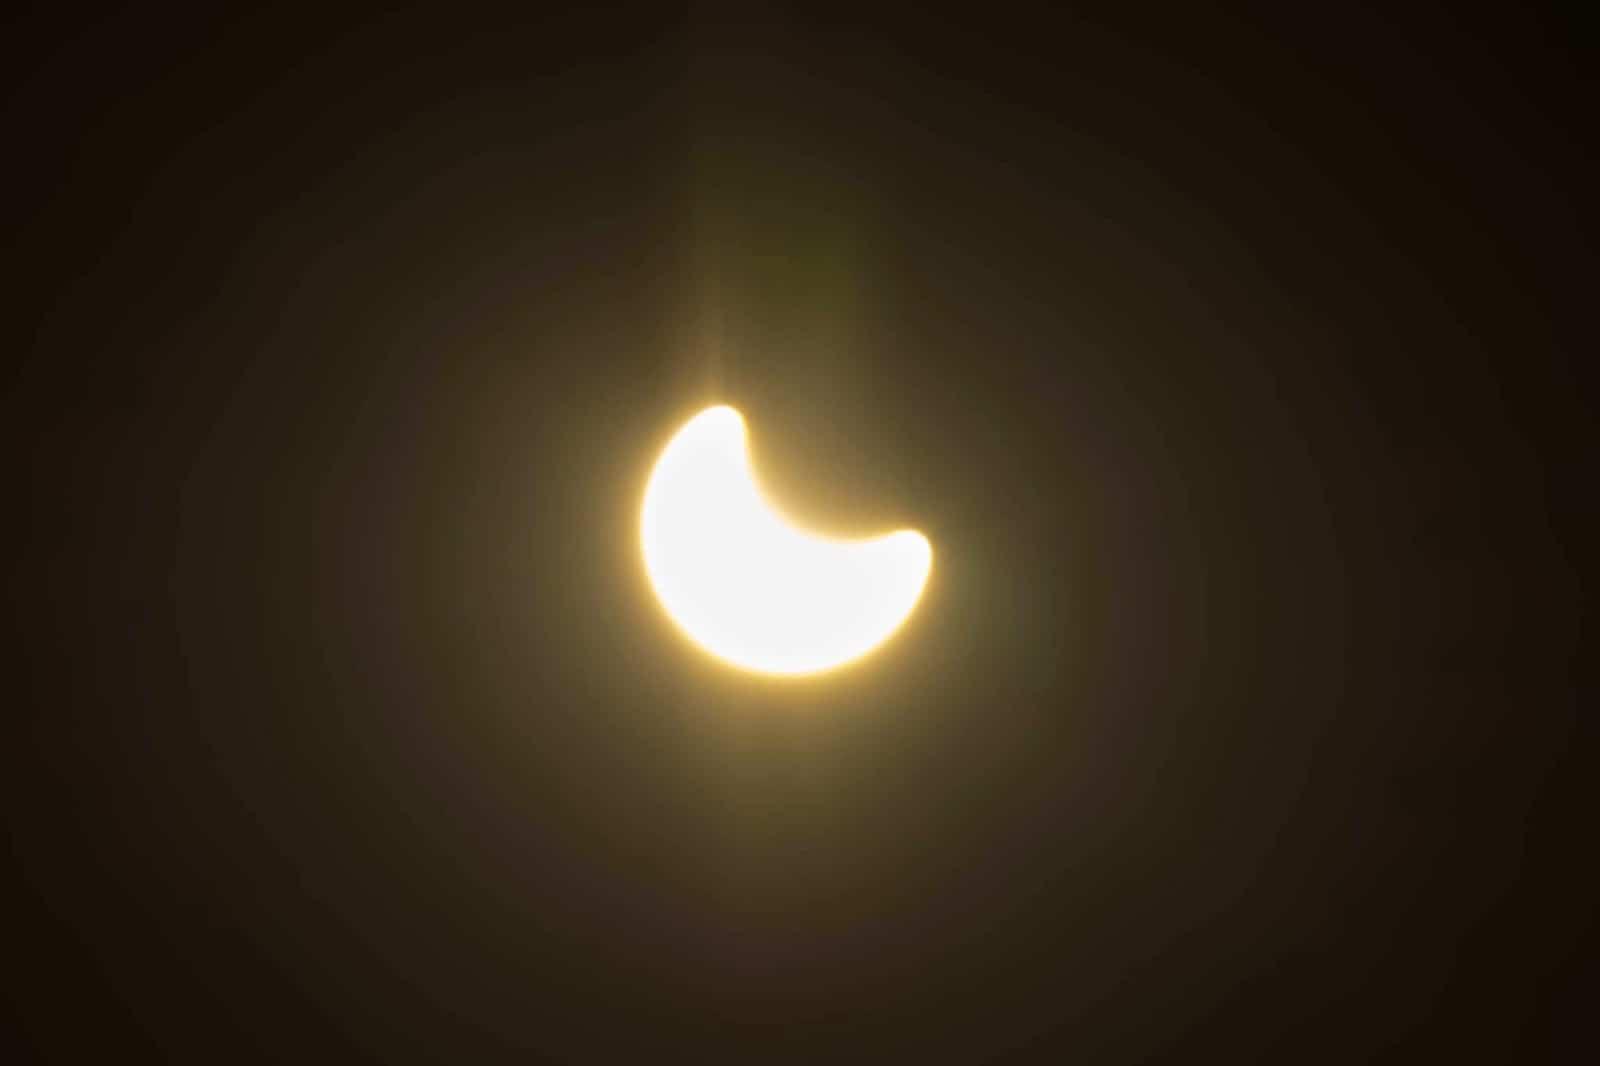 Solar Eclipse October 23rd 2014